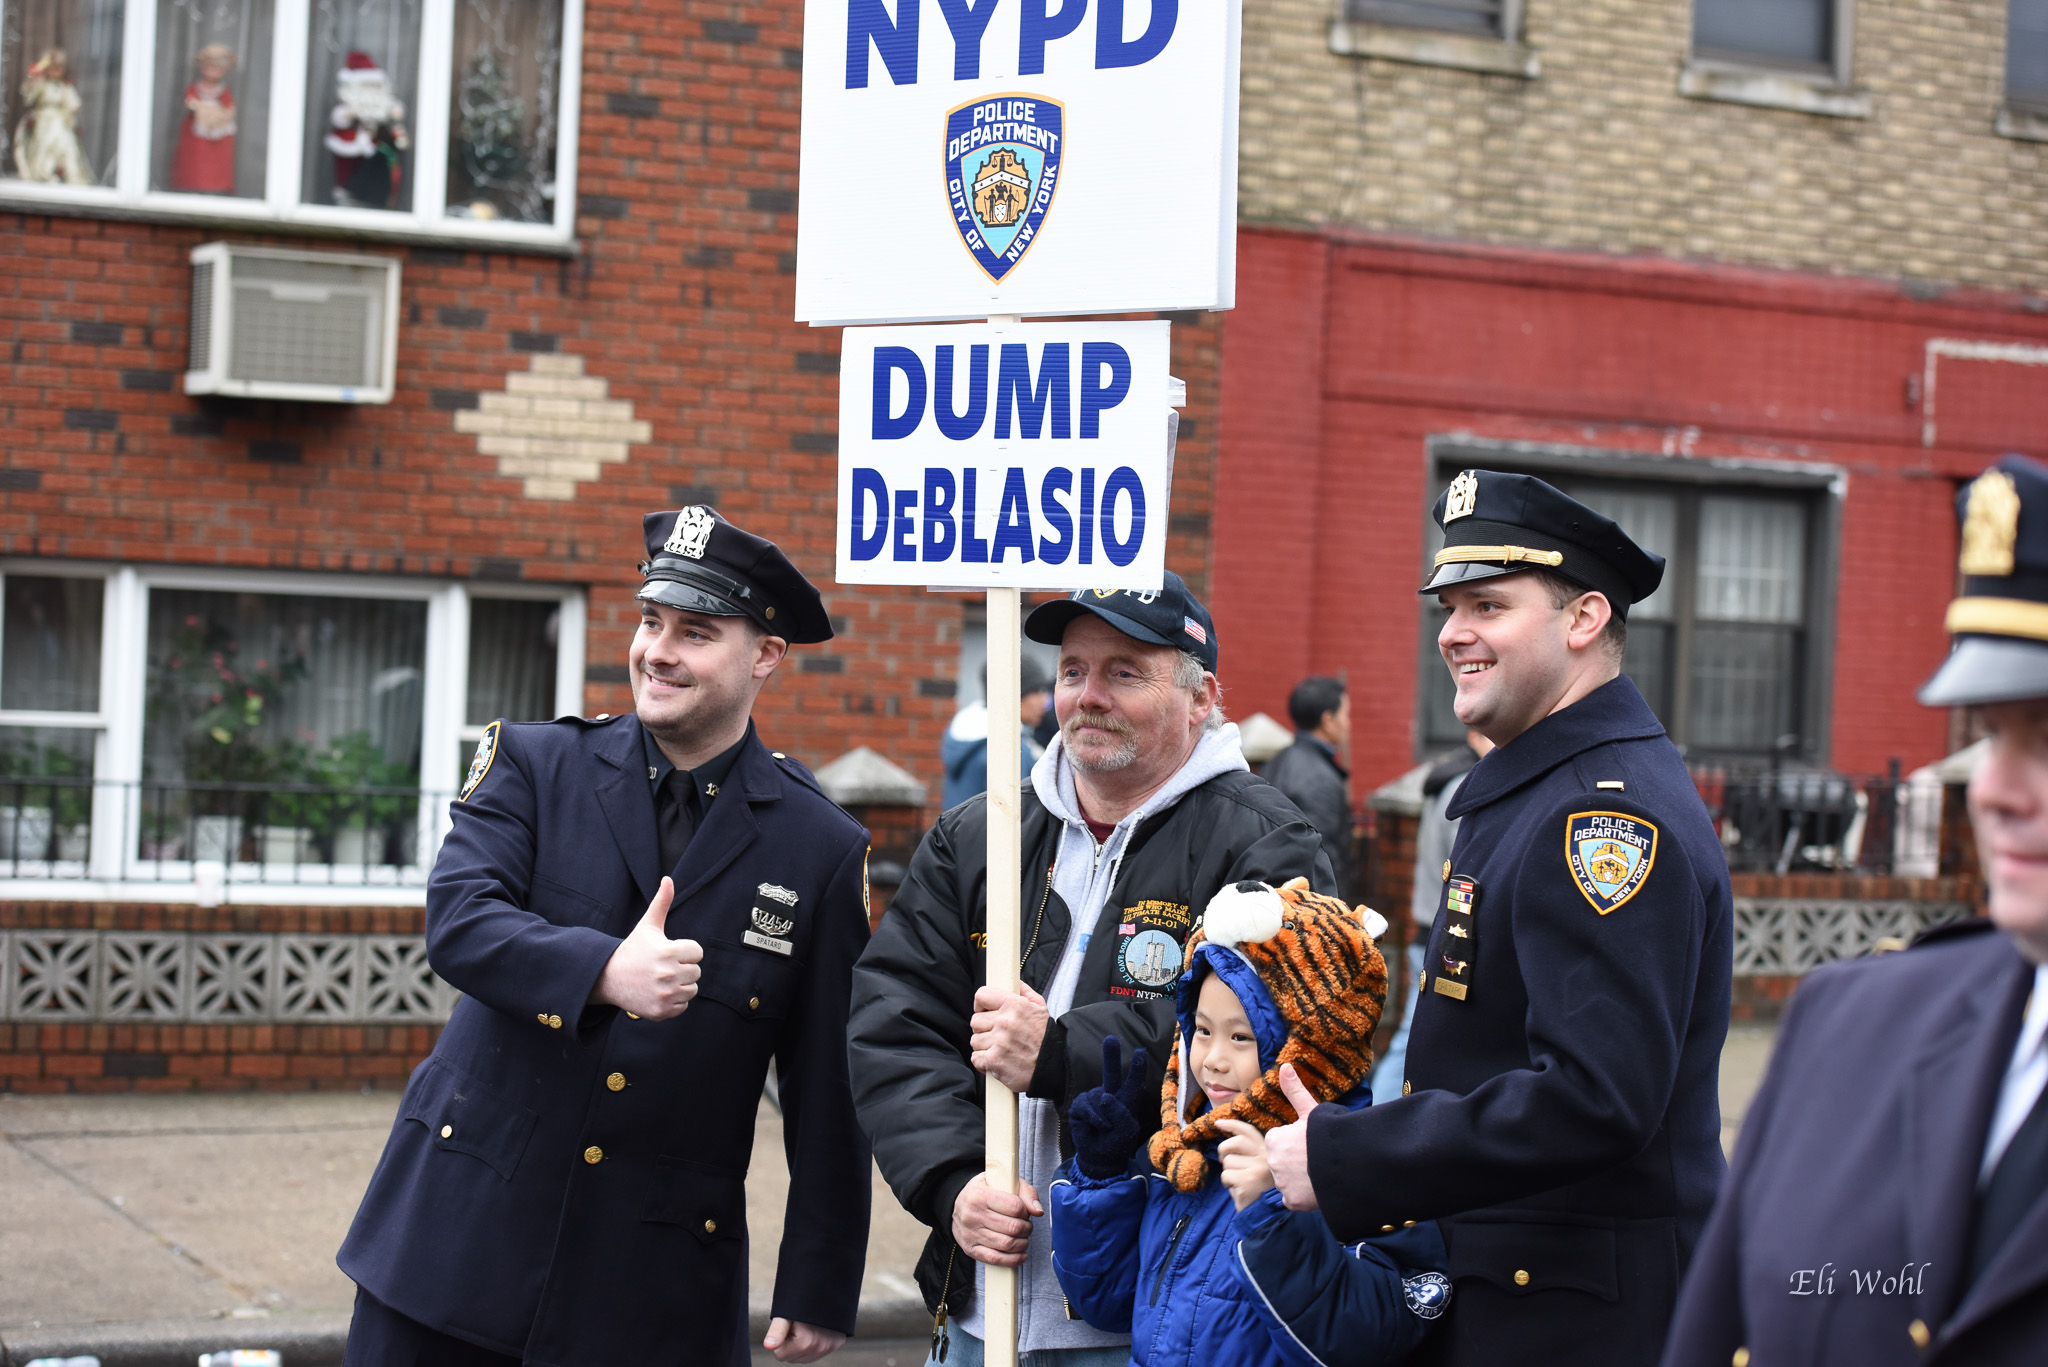 Bill de Blasio Blames NYC's Surging Violence on Guns